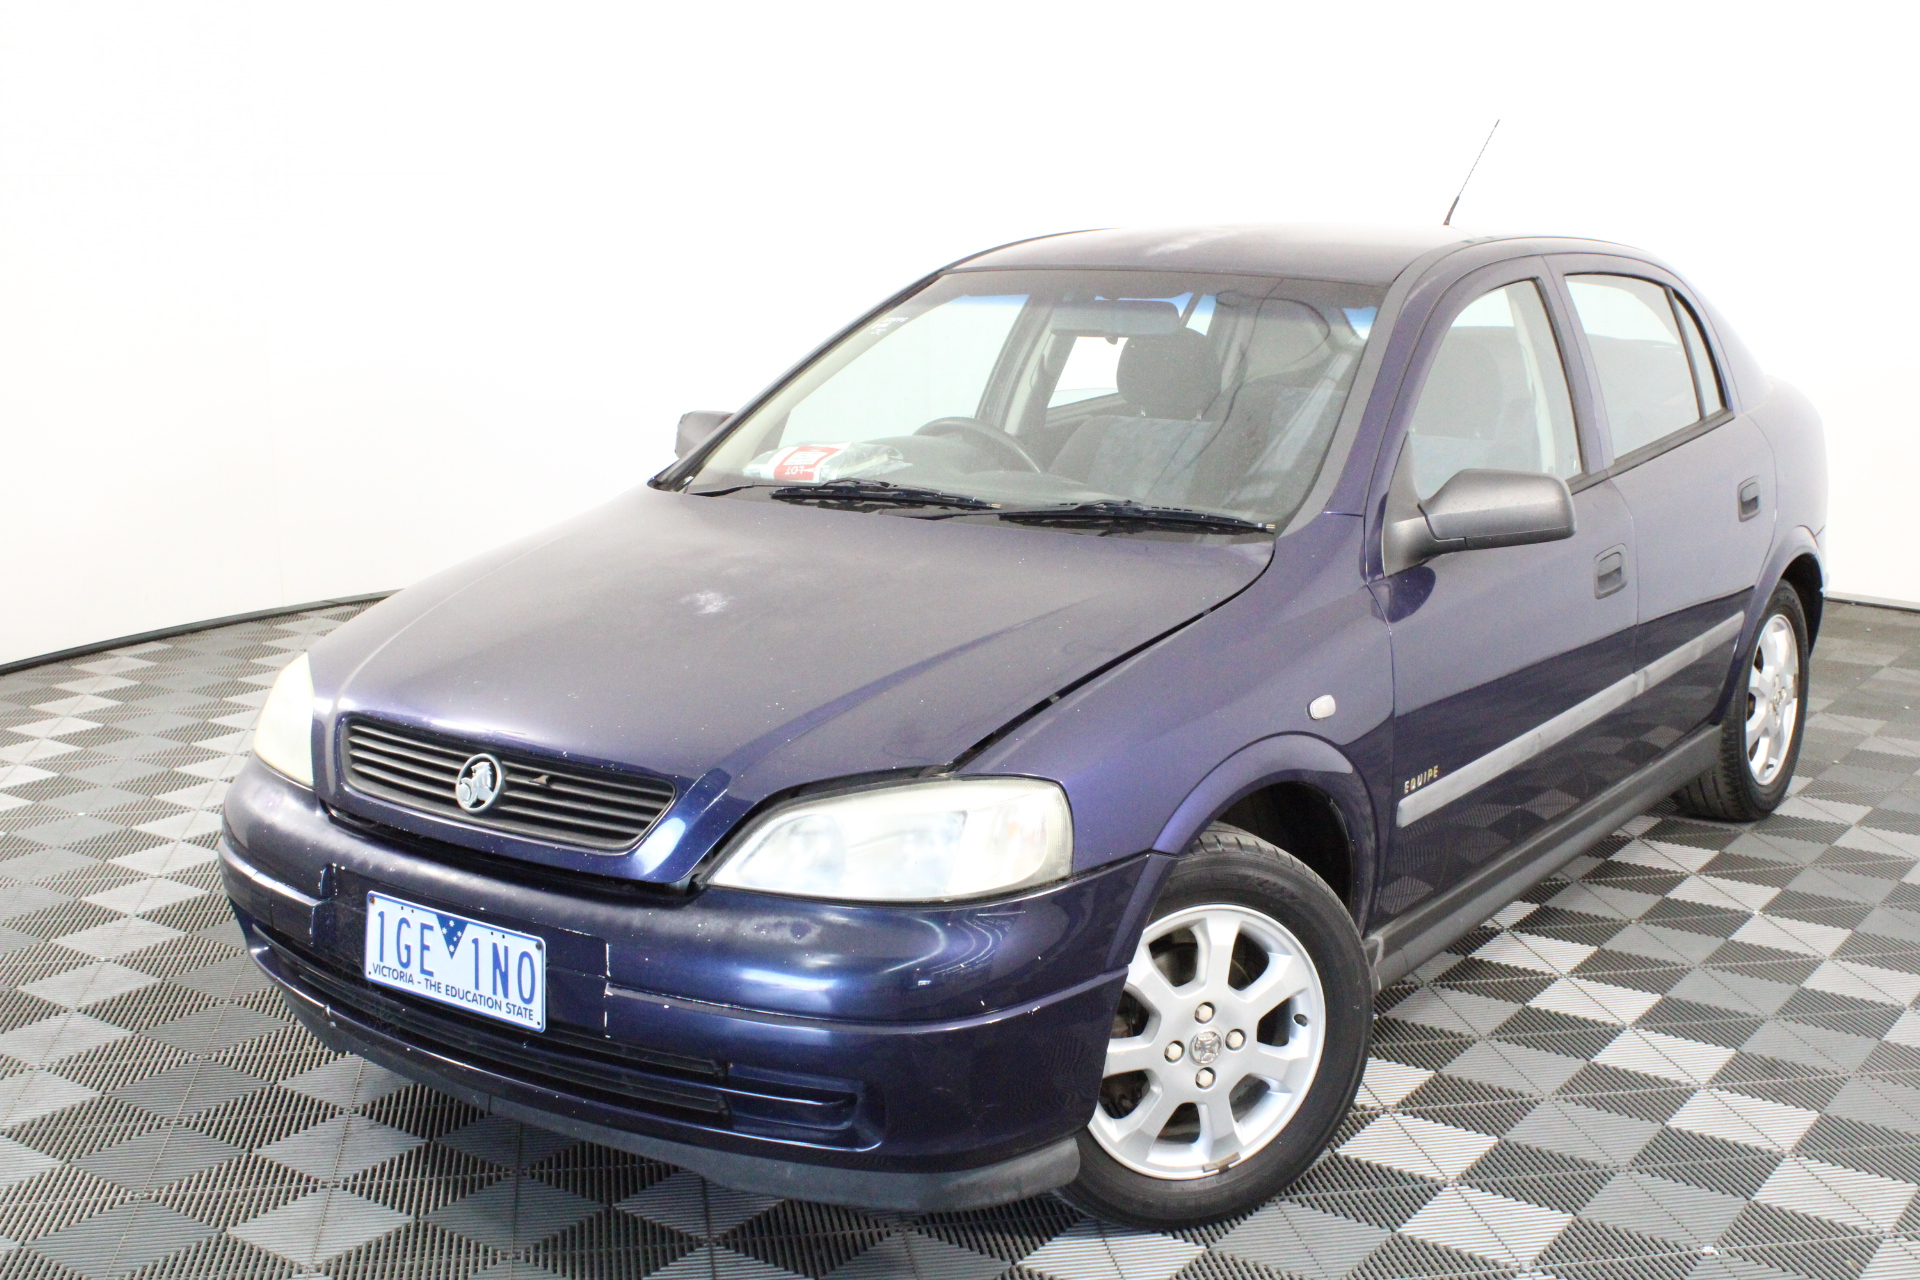 2001 Holden Astra City TS Manual Hatchback